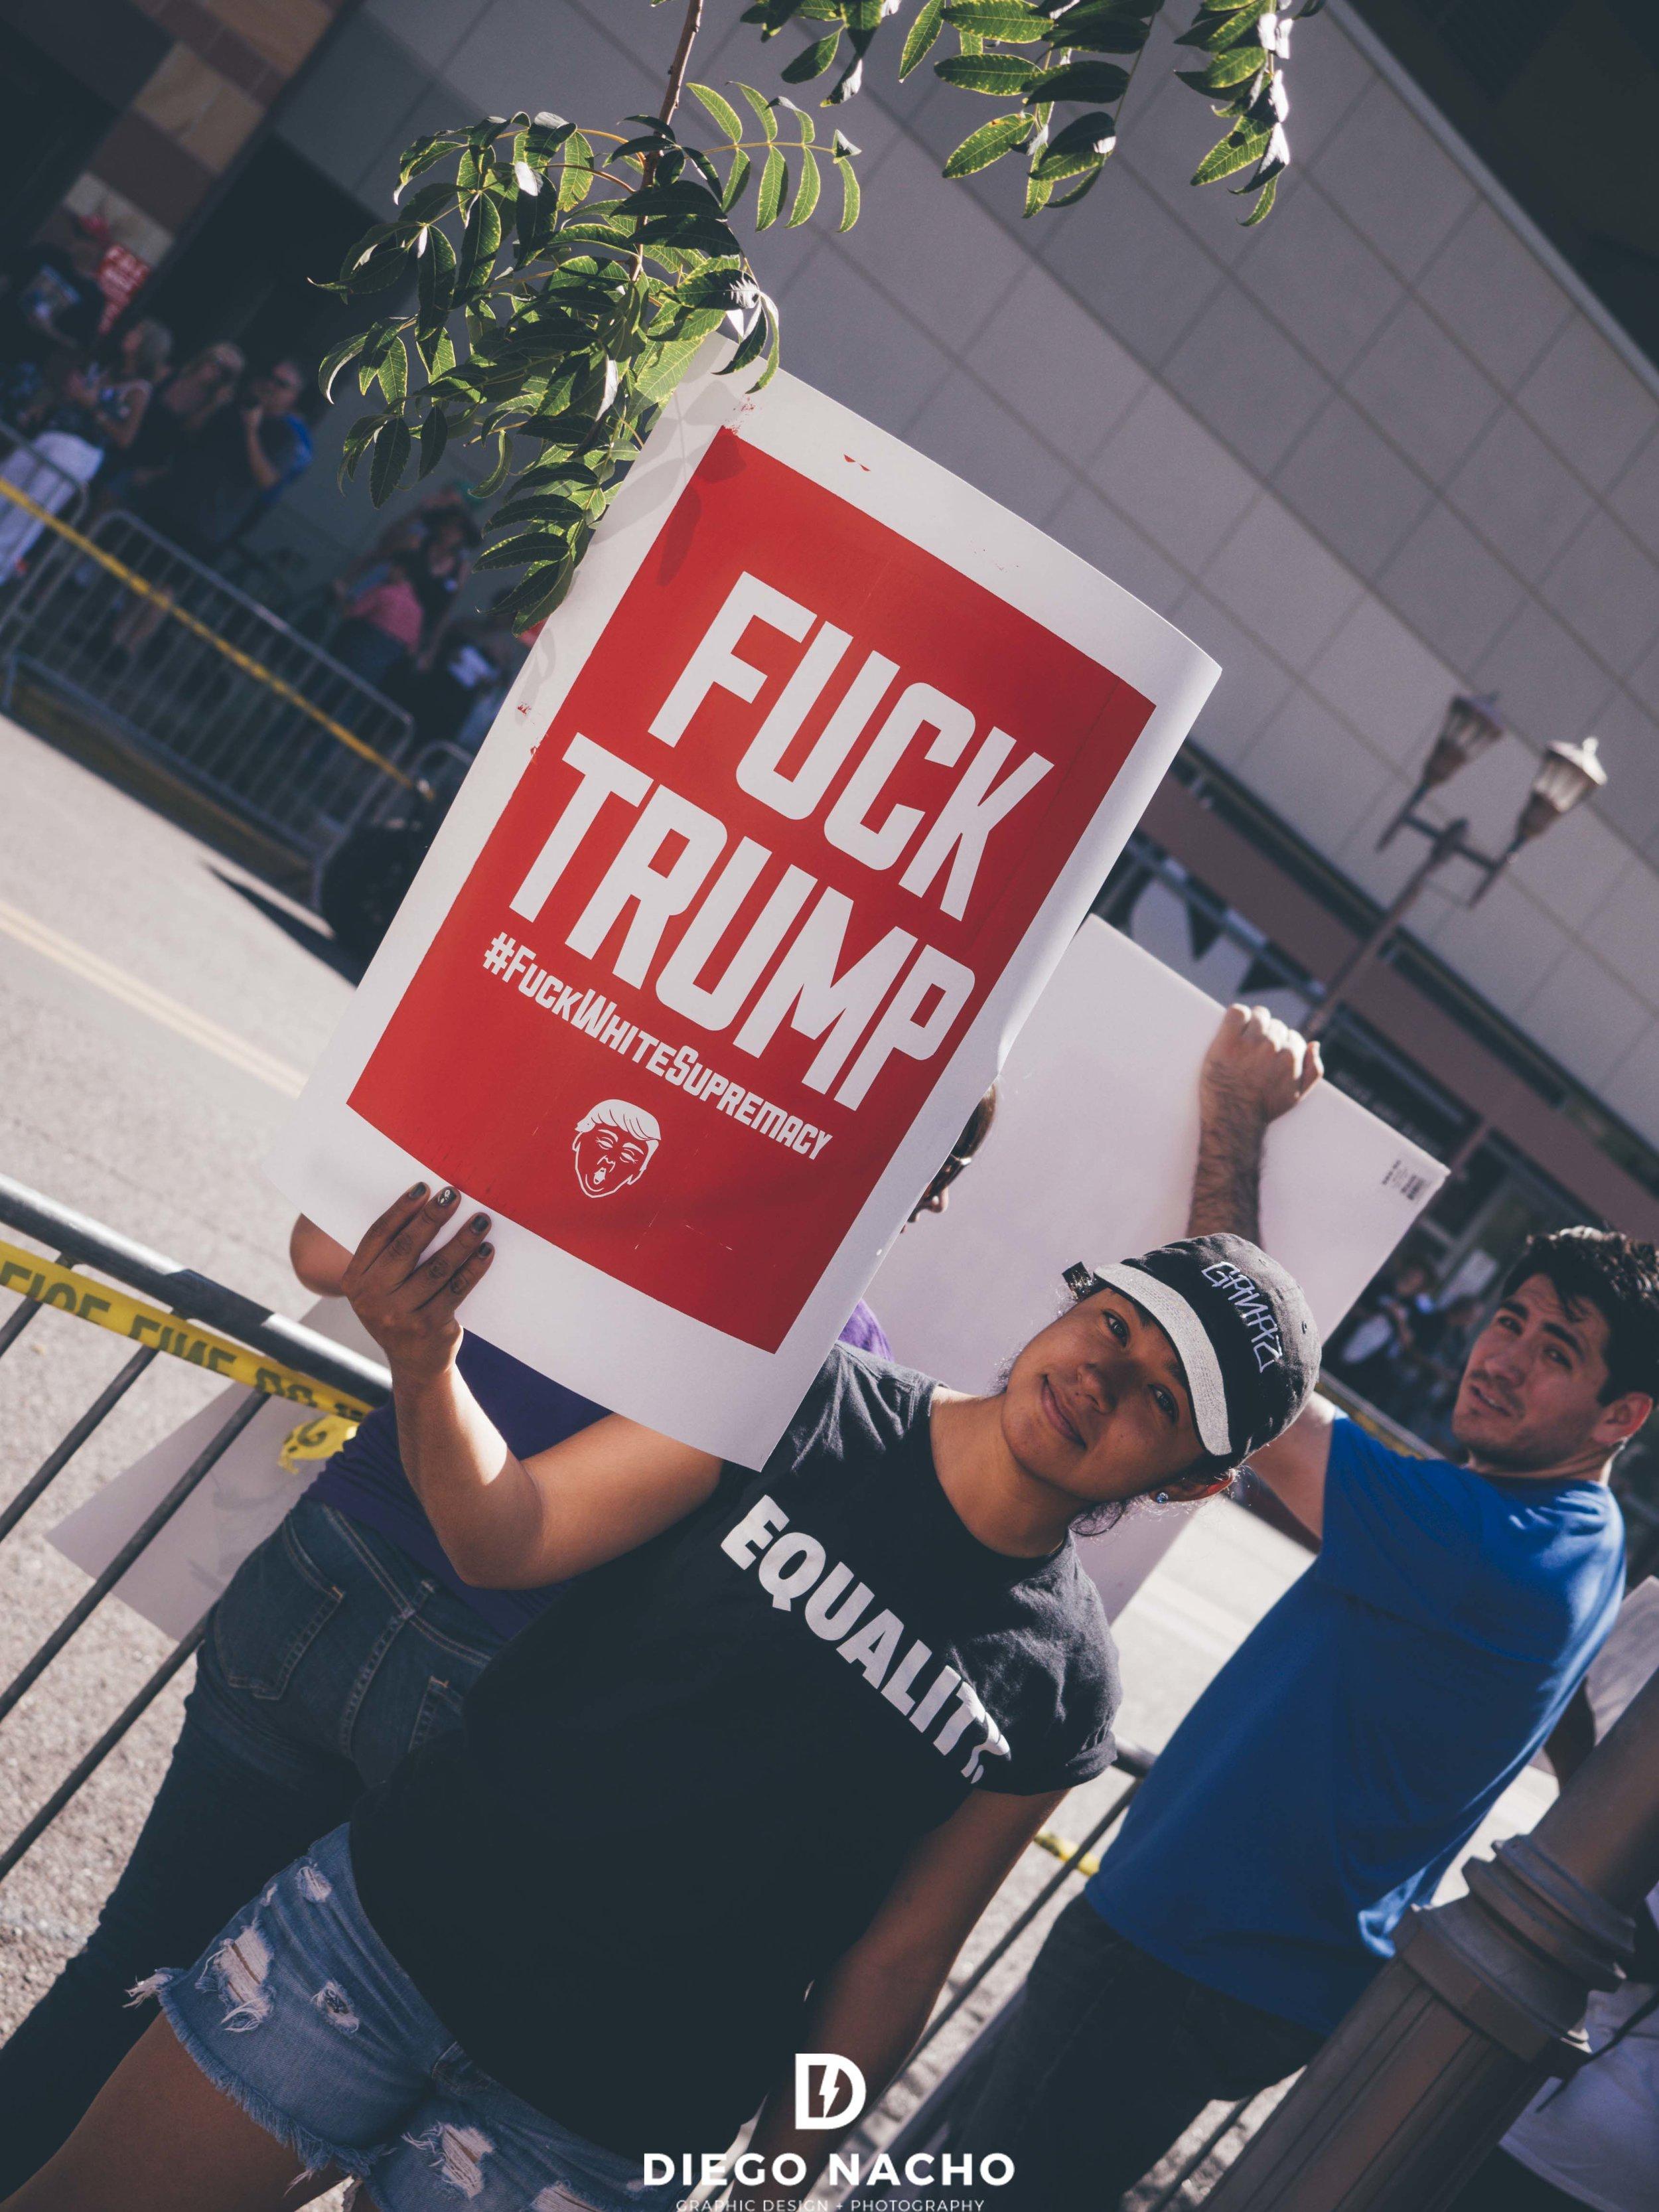 08-22-2017 Phoenix Trump Rally 2017_1082.jpg